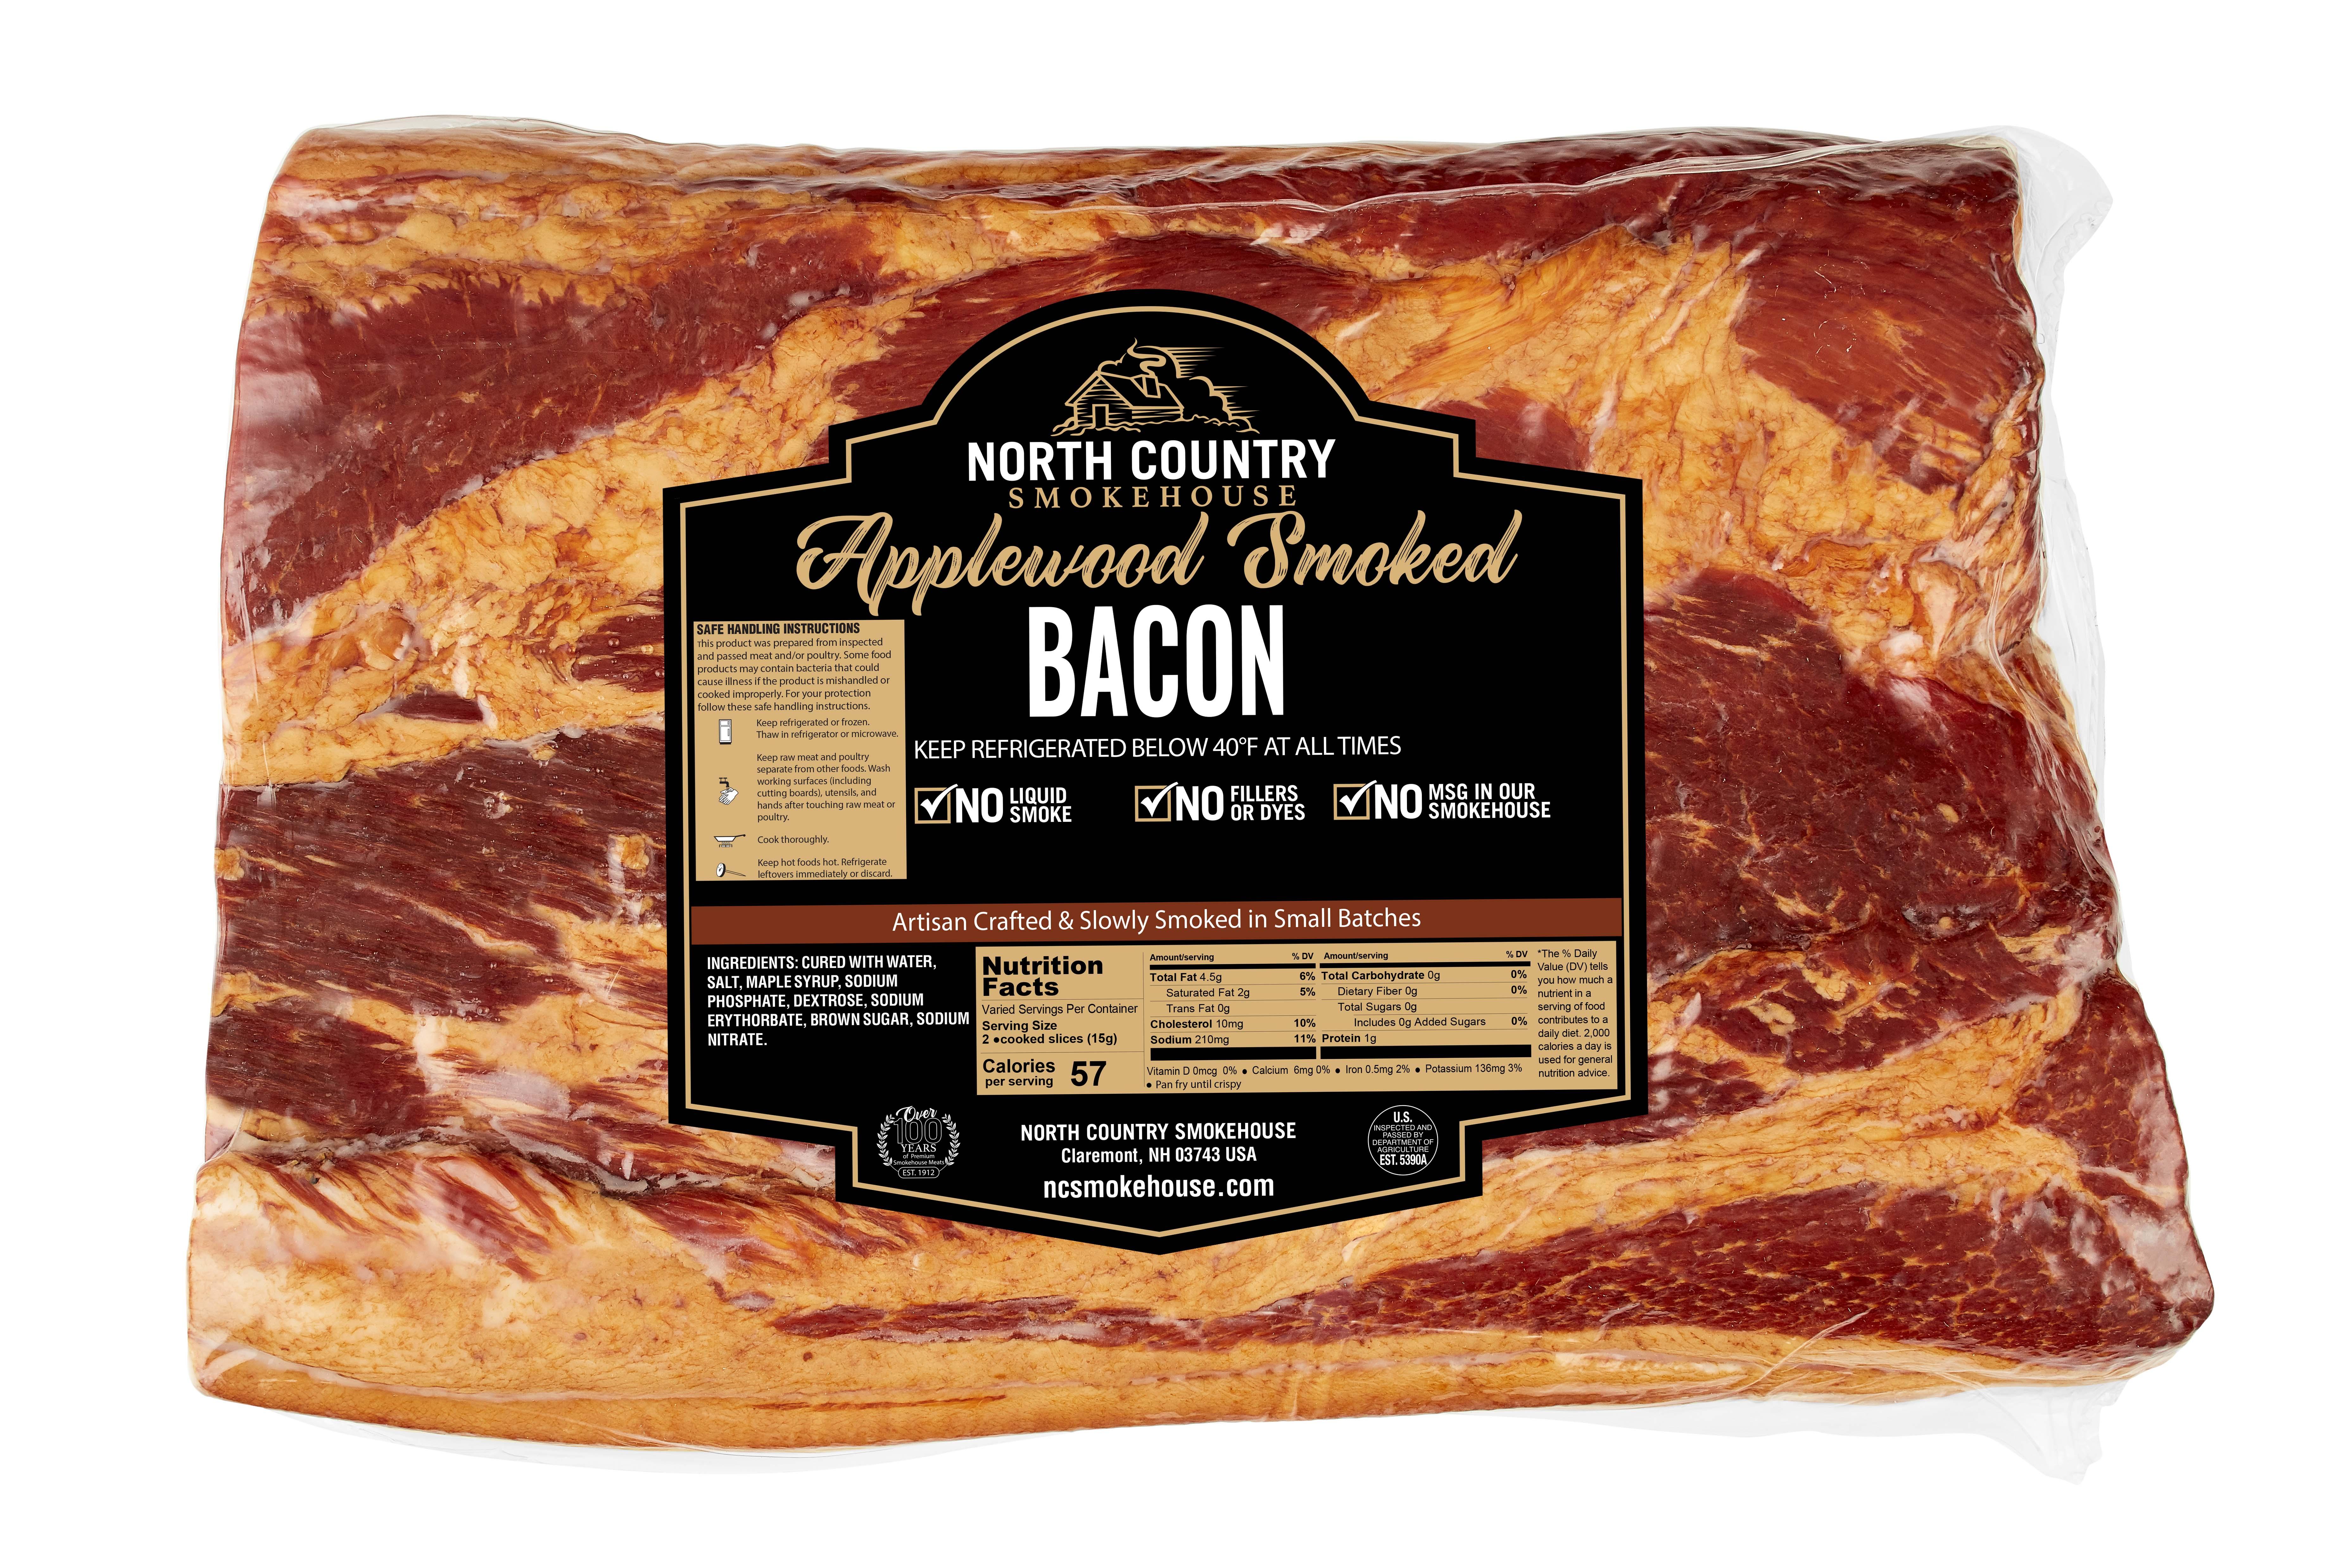 Original Applewood Smoked Slab Bacon - 1, 5-7 lb. package